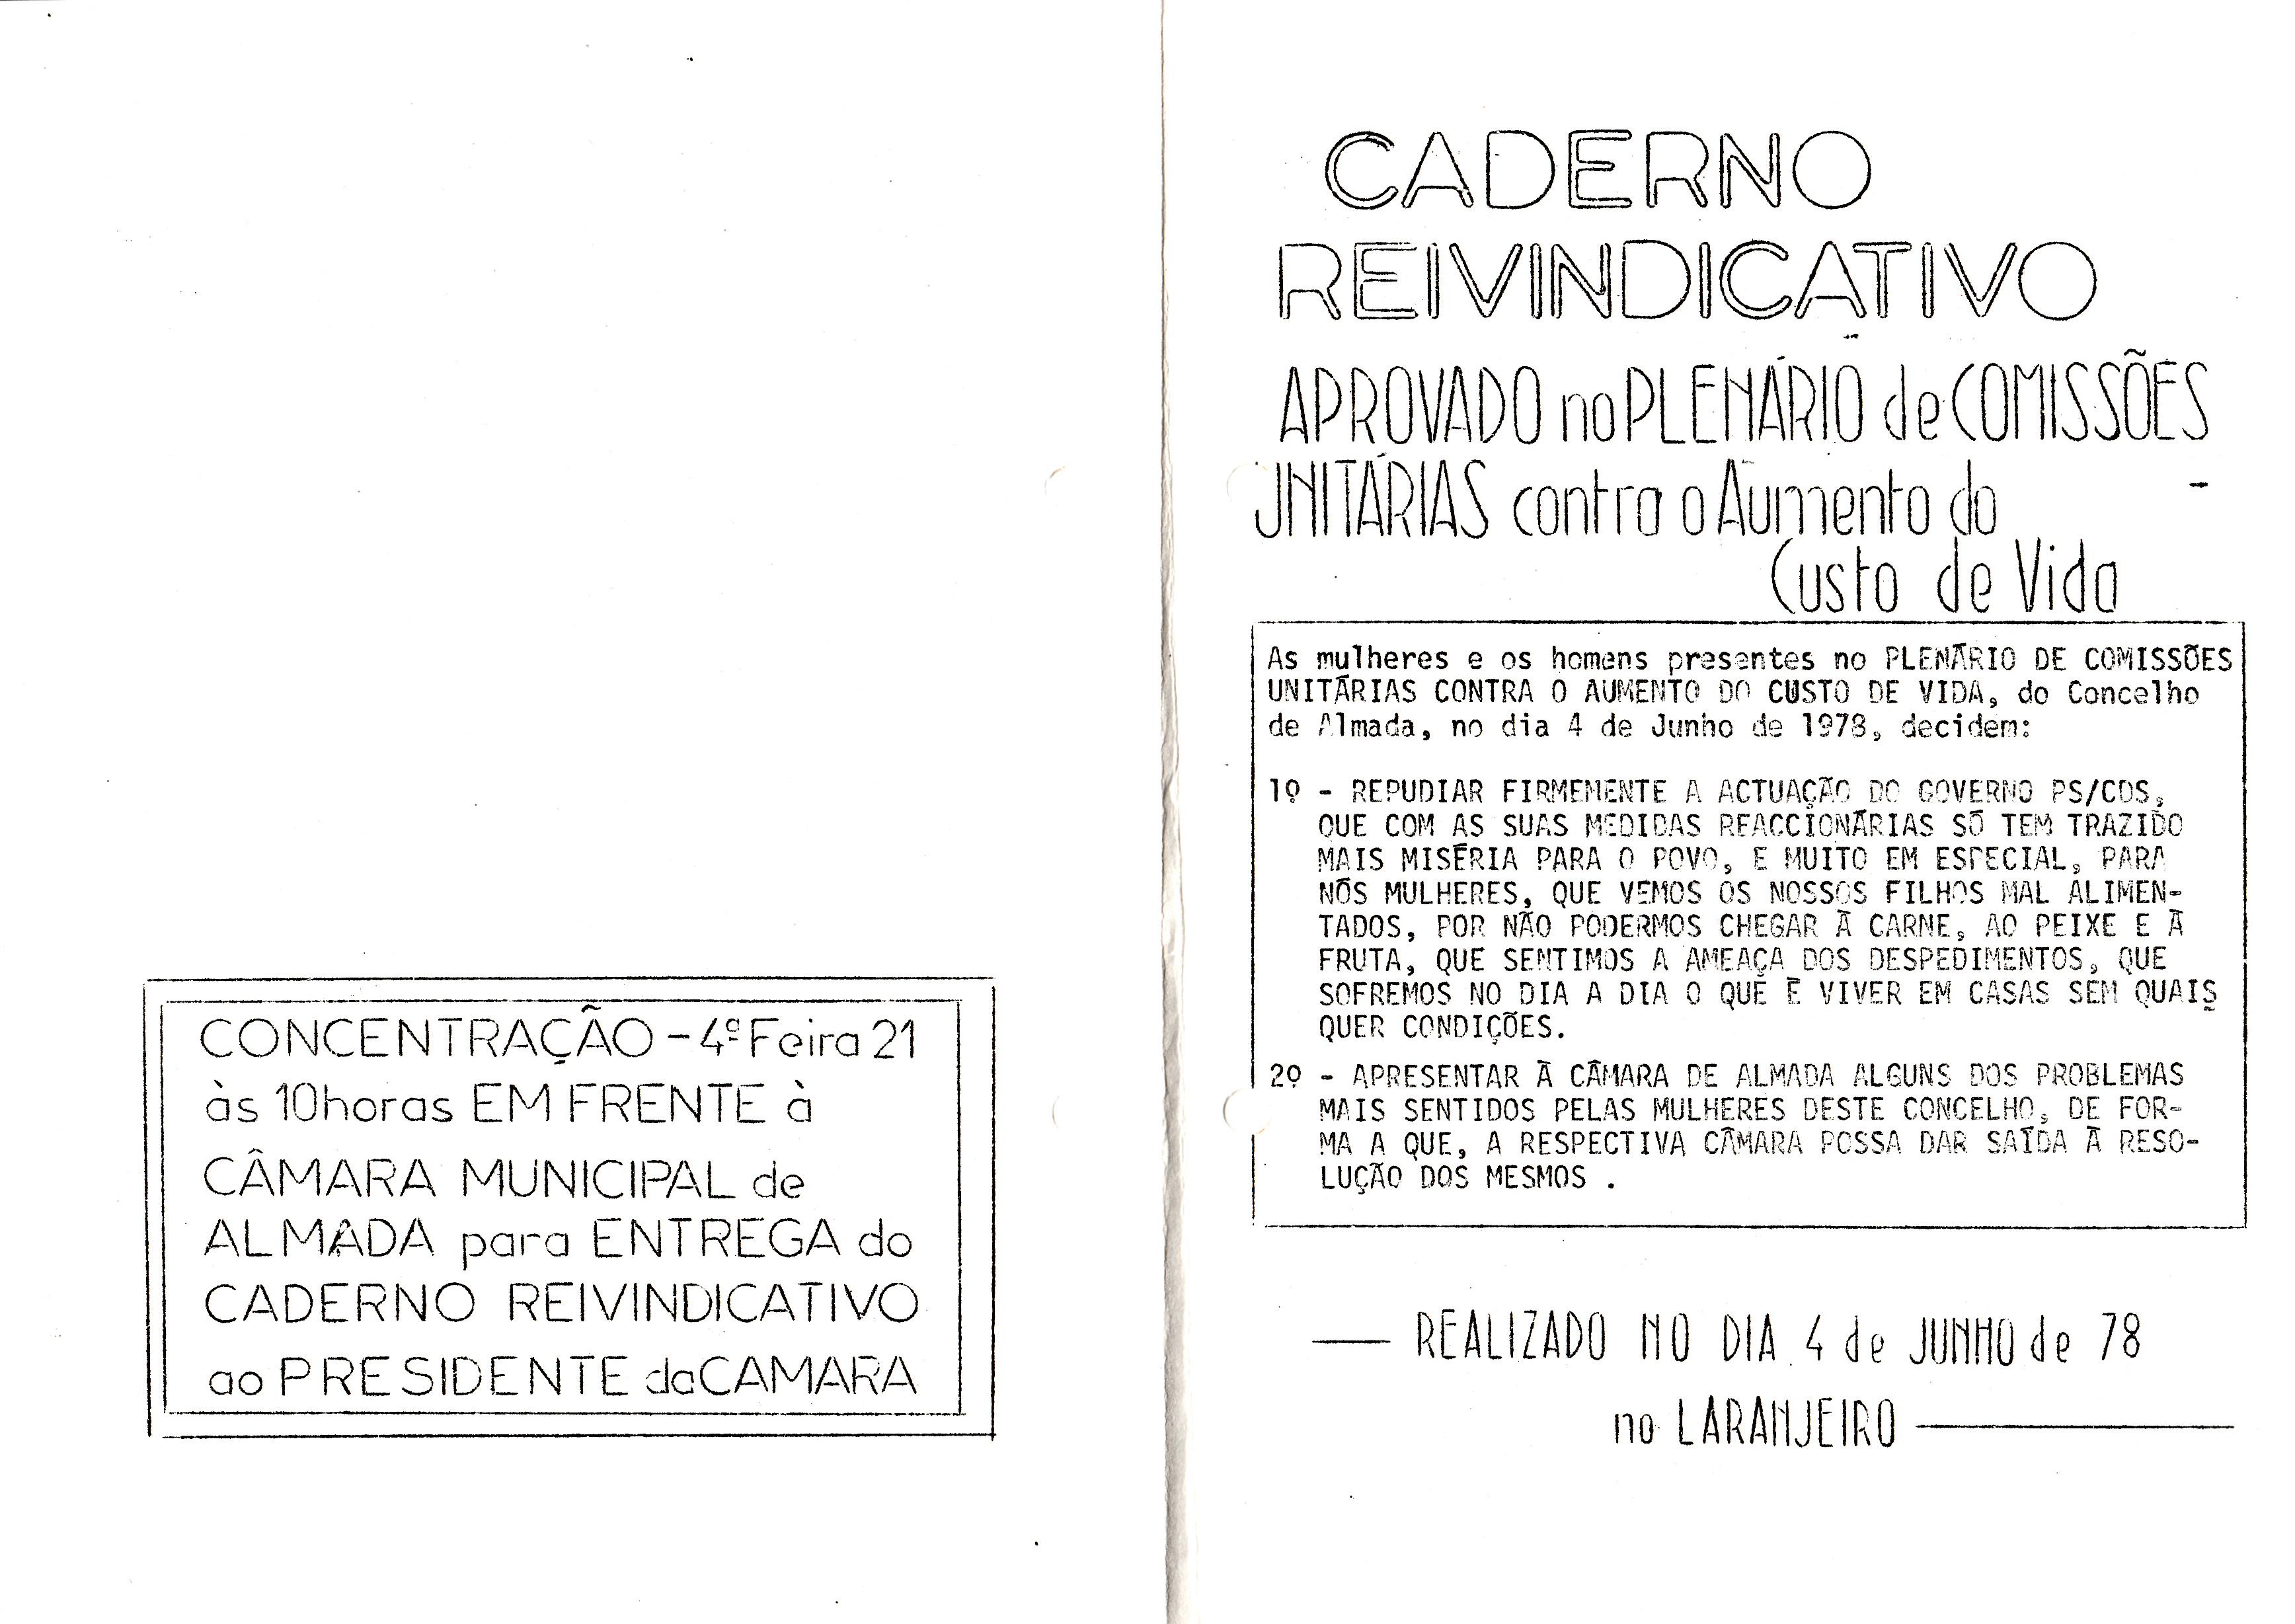 Comissoes_Unitarias_Aumento_Custo_Vida_0001